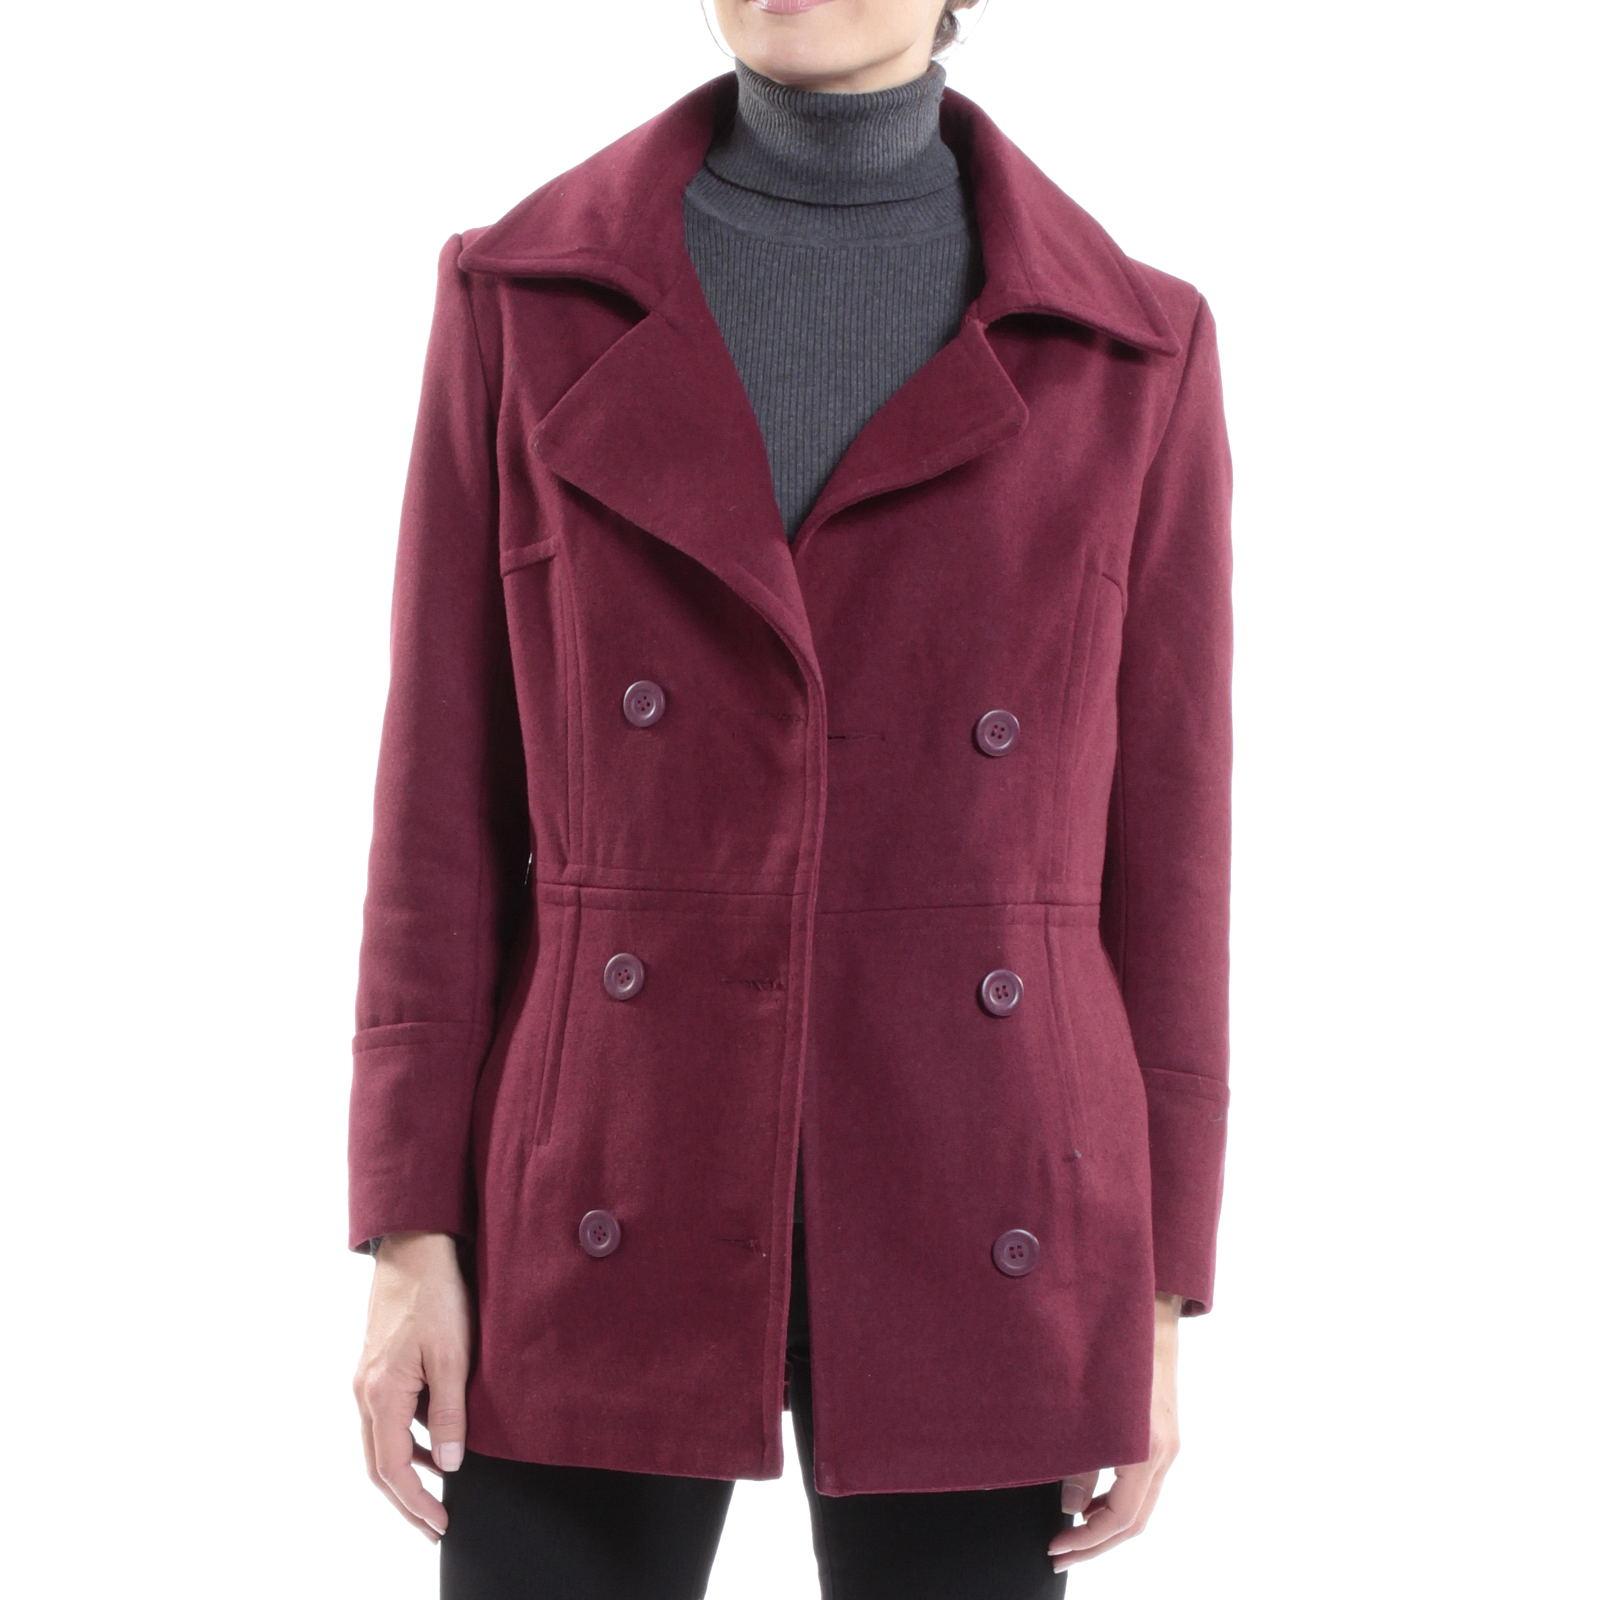 Alpine-Swiss-Emma-Womens-Peacoat-Jacket-Wool-Blazer-Double-Breasted-Overcoat-New thumbnail 32